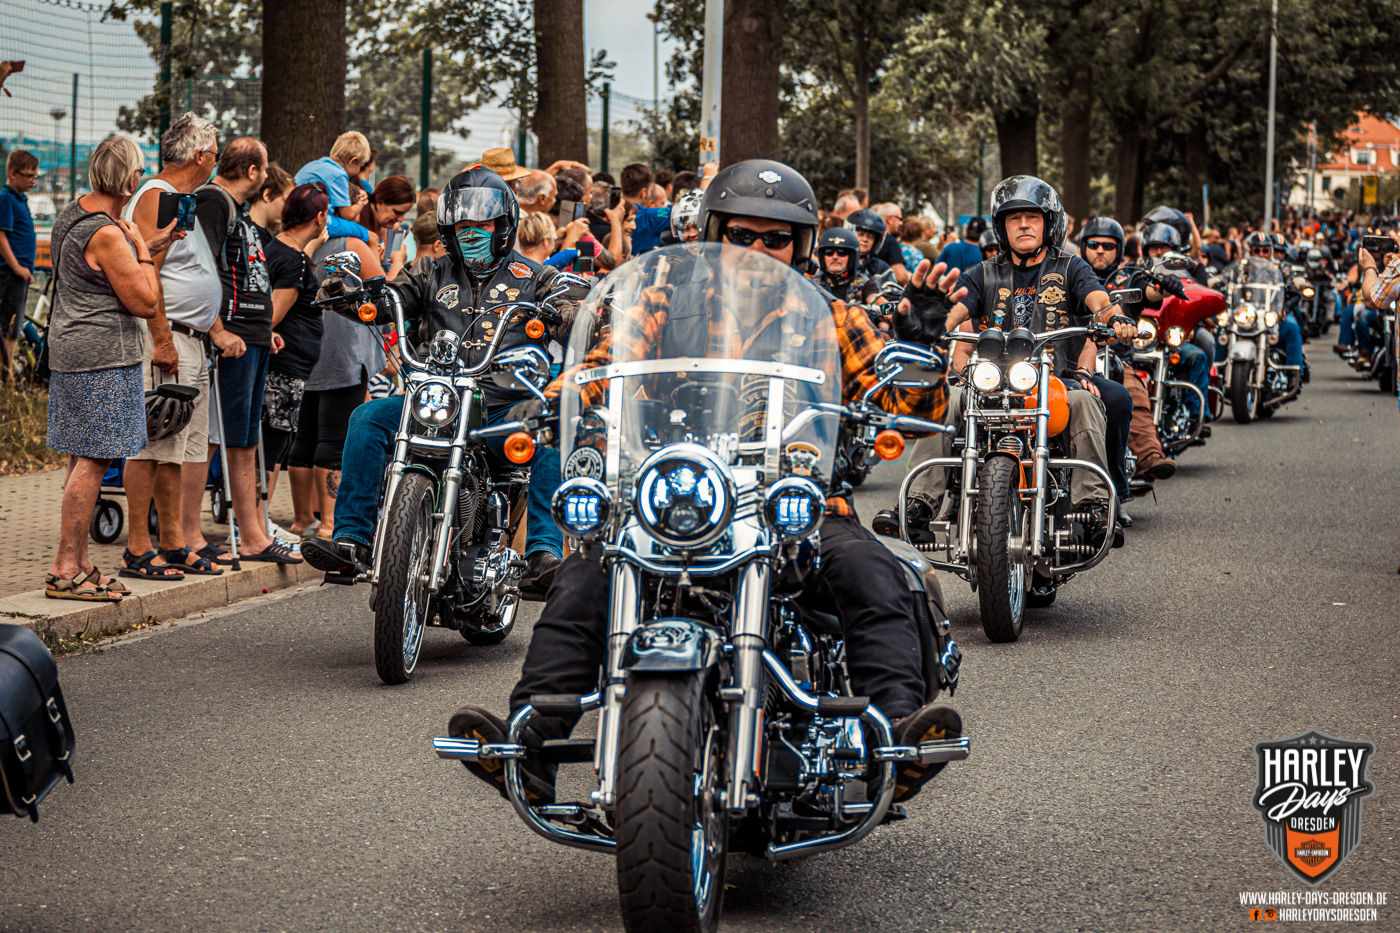 Harley Days Dresden 2019, Biker Parade